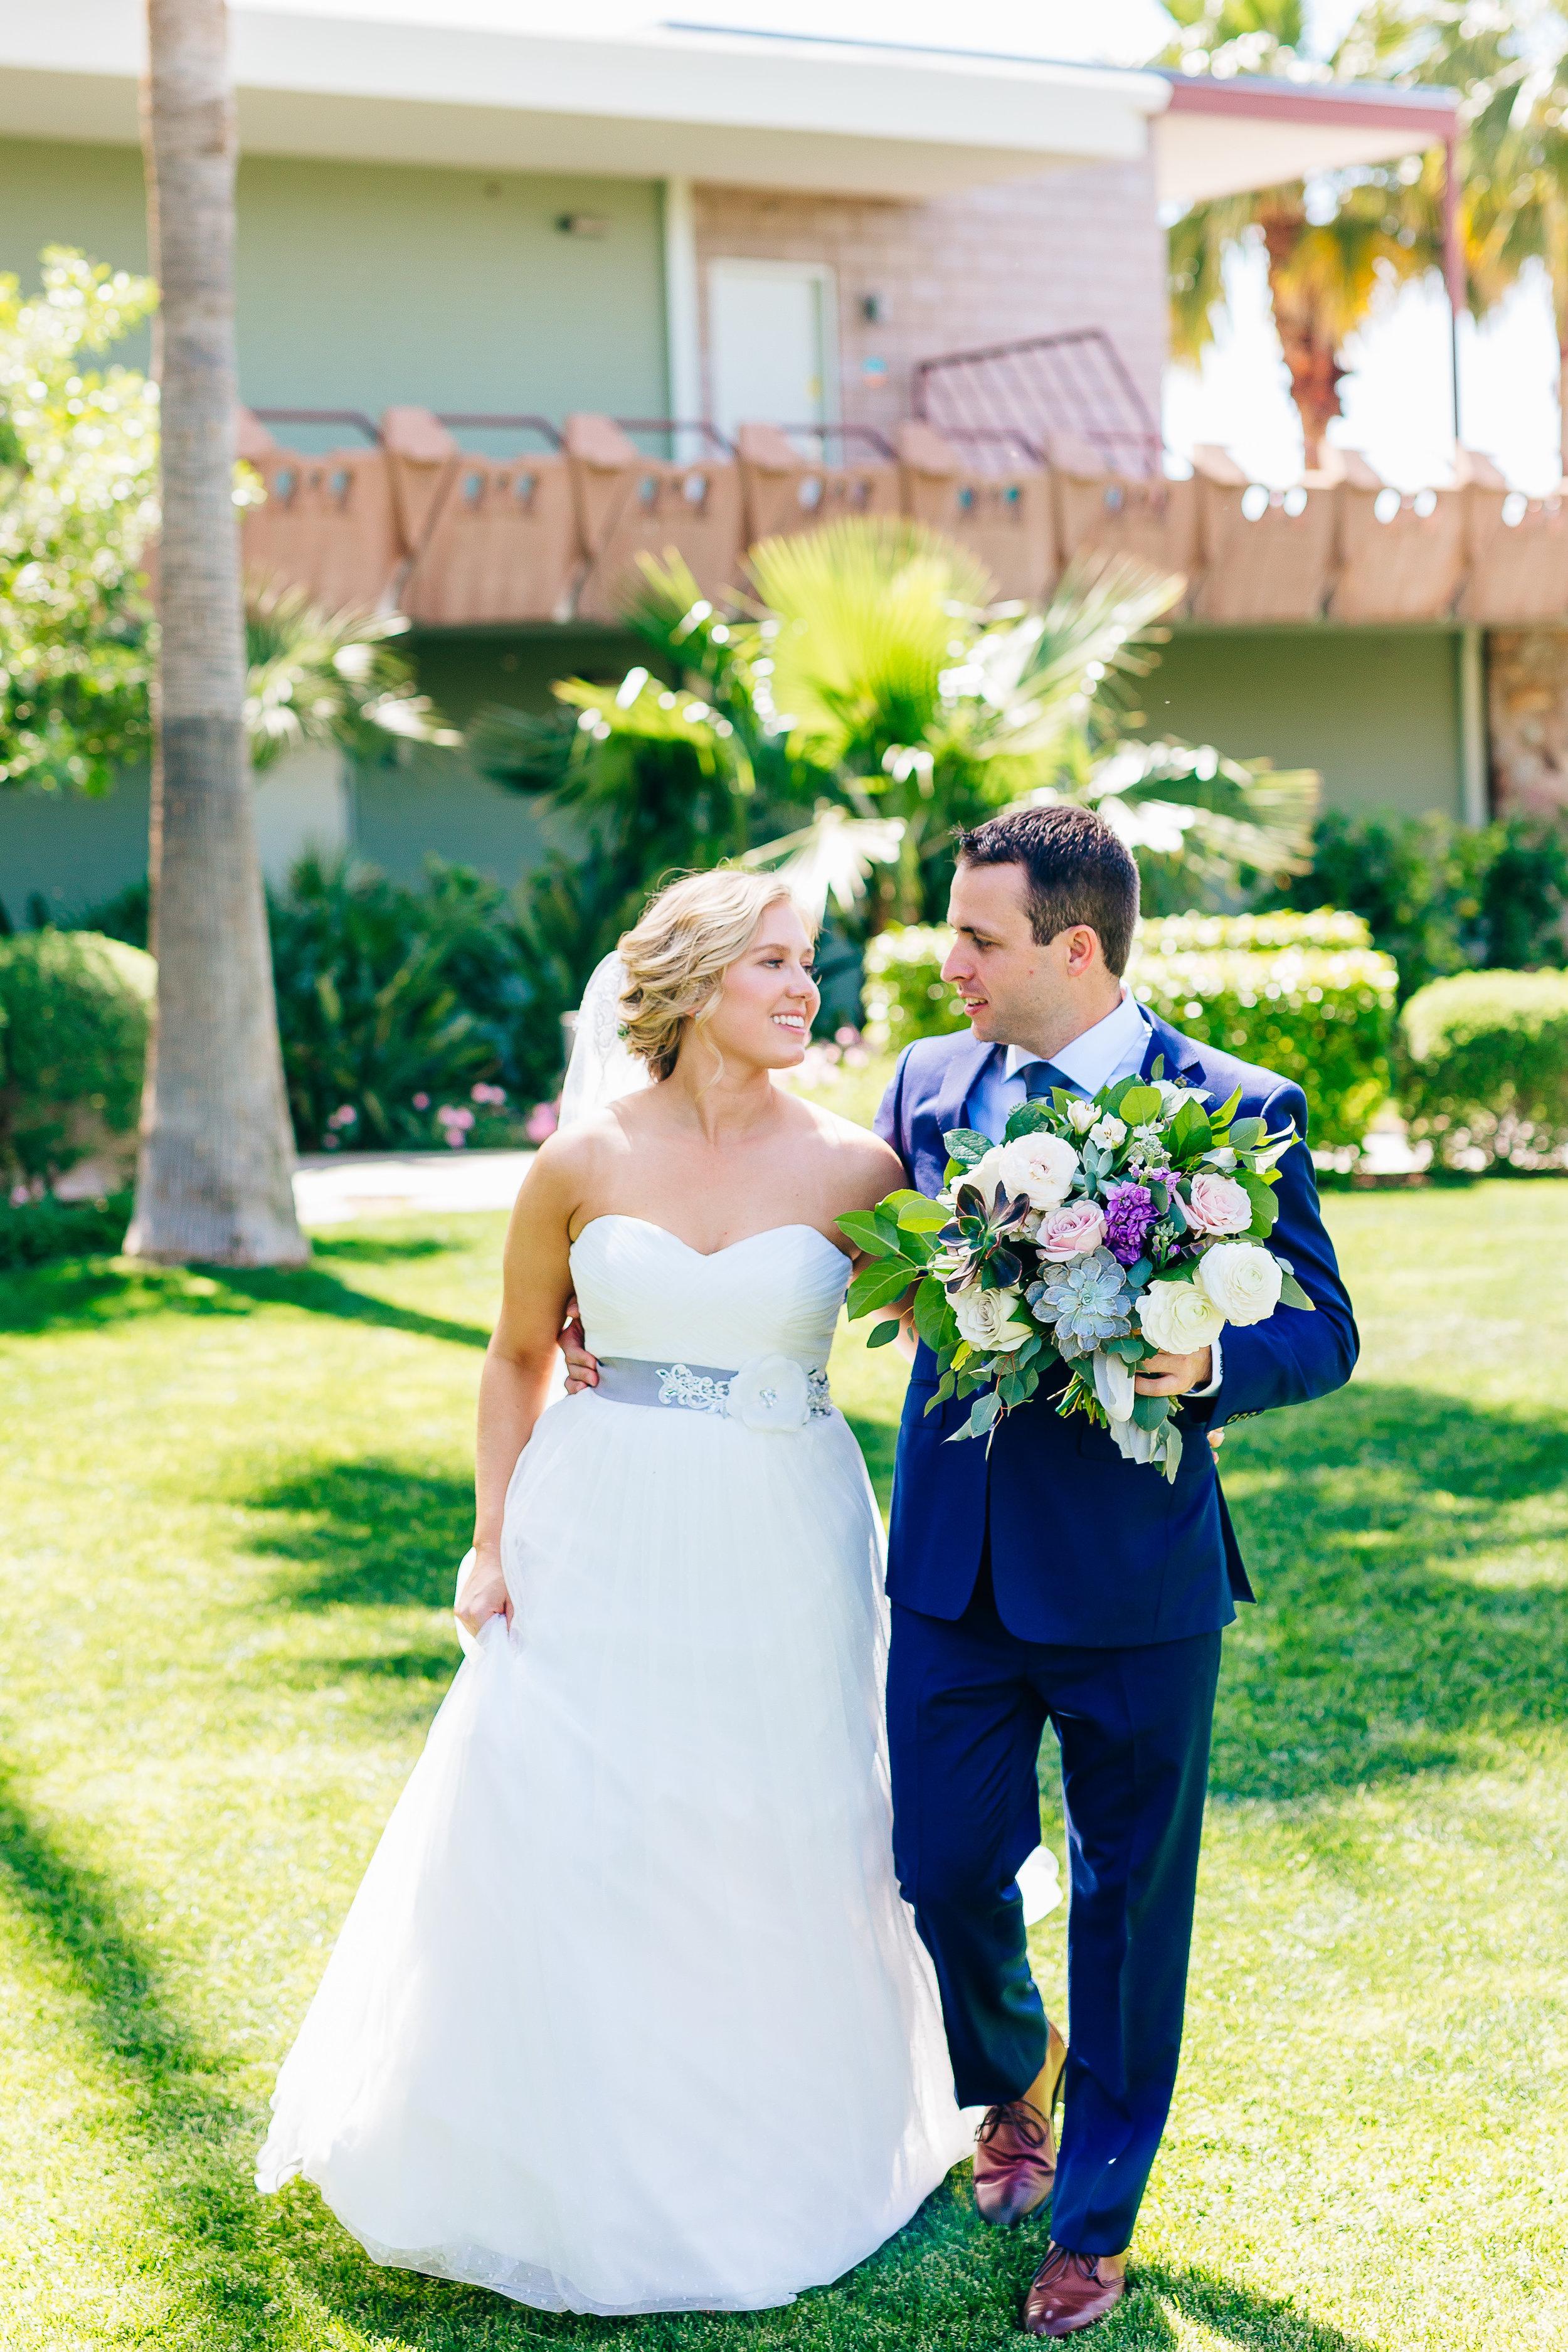 Desert Inspired Spring Wedding at Hotel Valley Ho - Succulent Bouquet